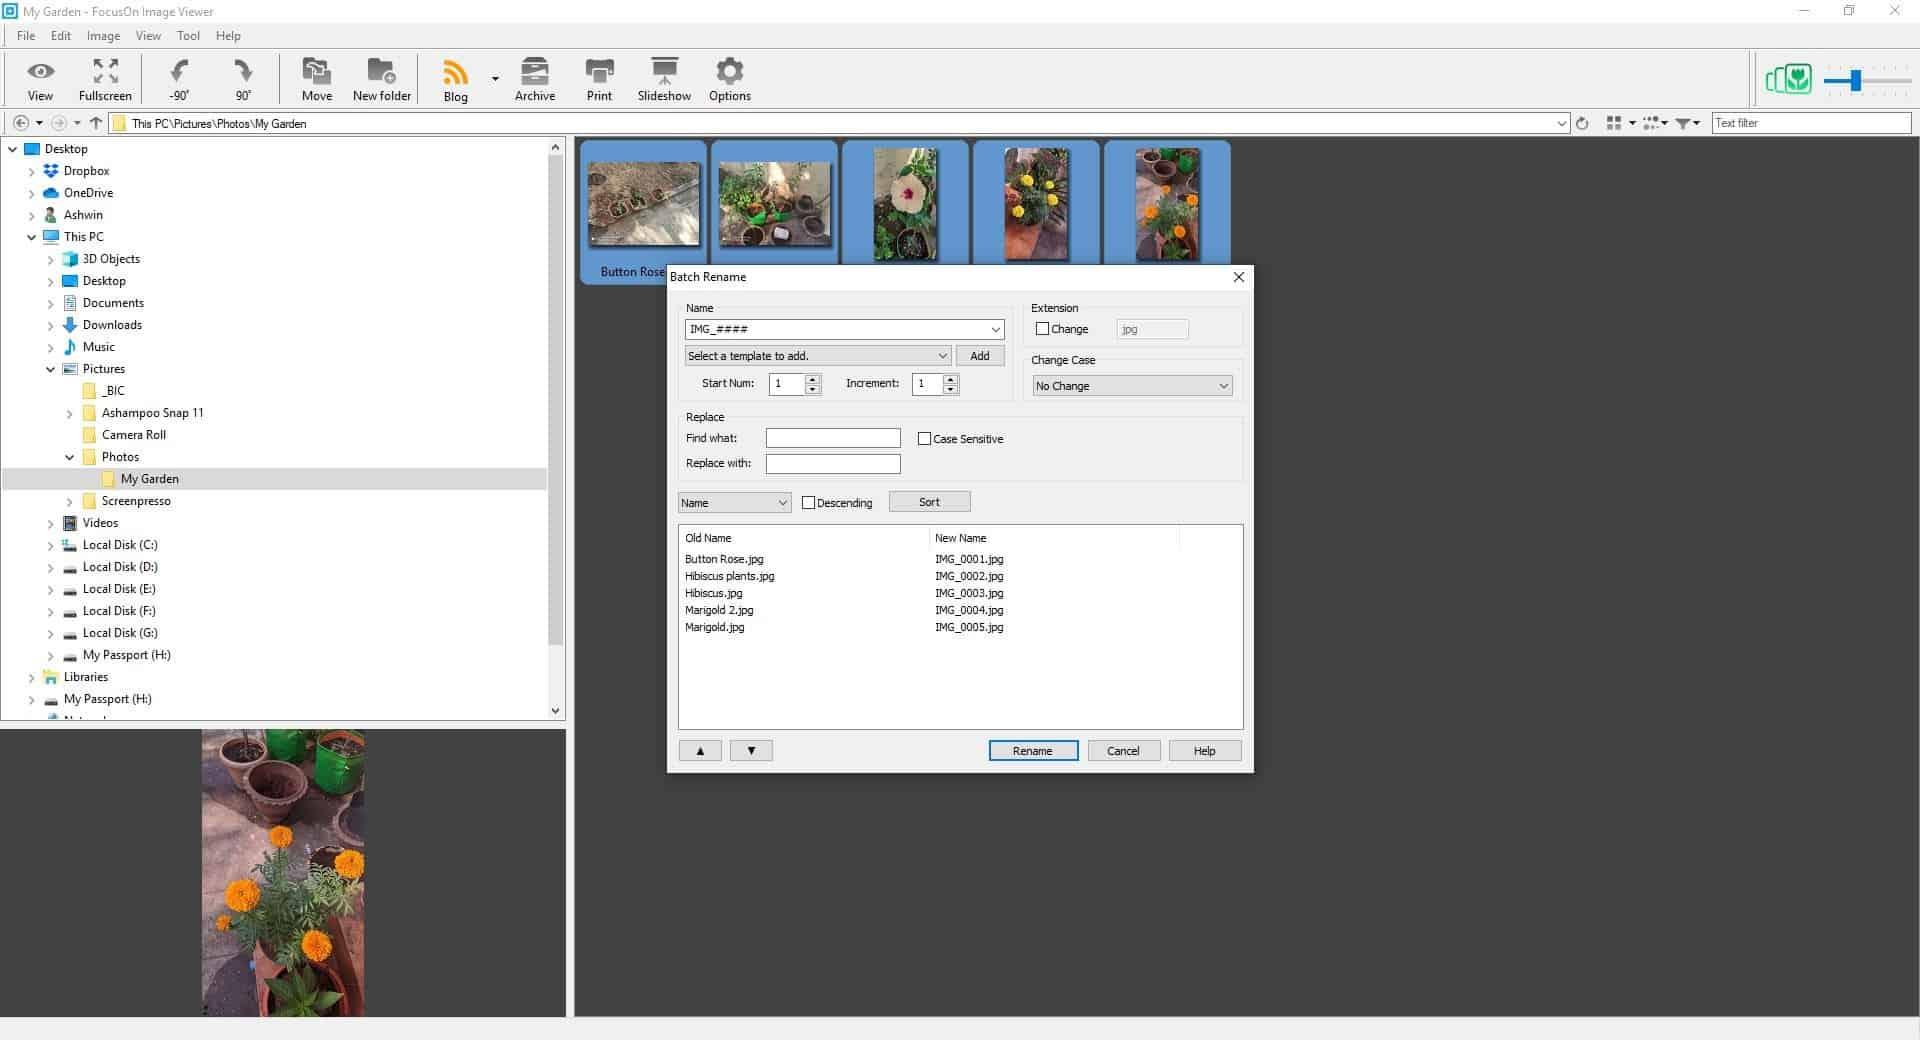 FocusOn Image Viewer Batch Renamer tool